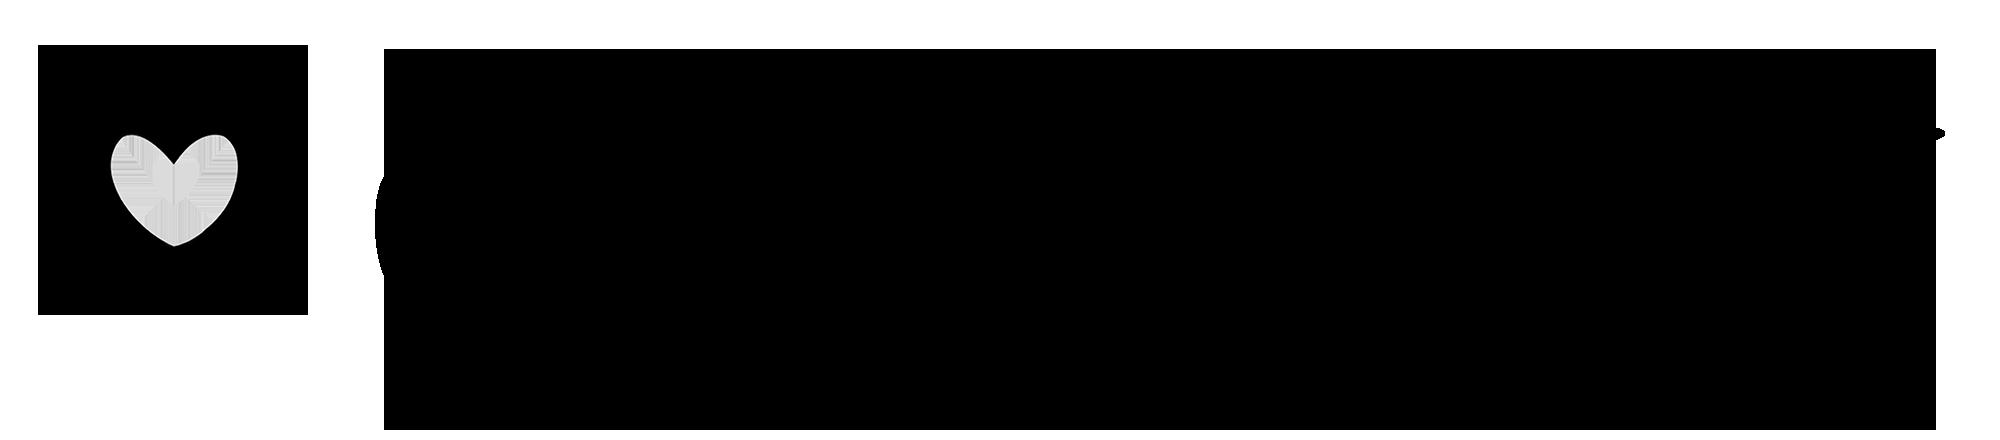 Logo and wordmark design, trademarking, and registration